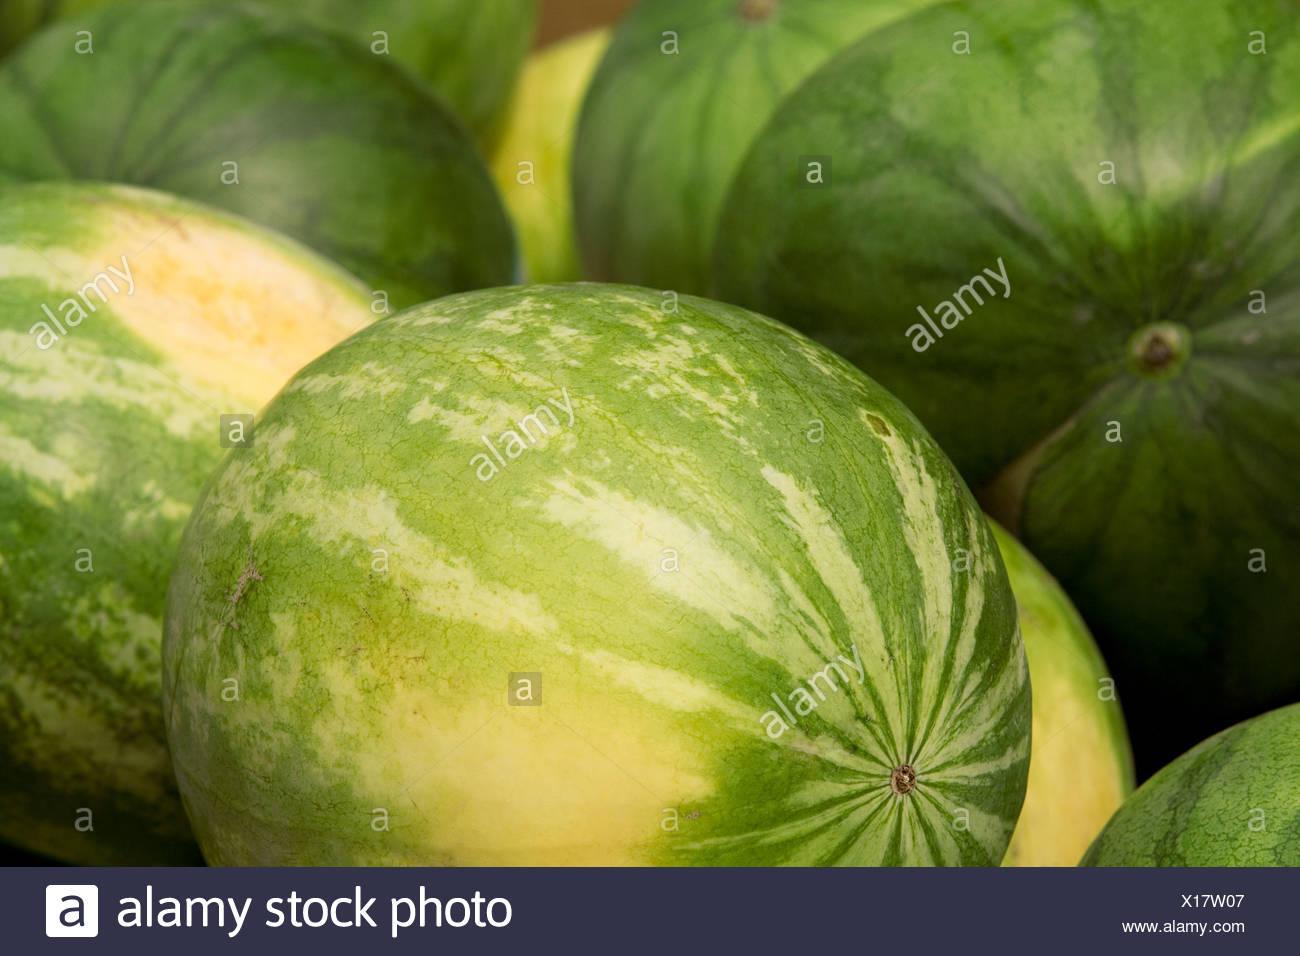 Frische, gesunde, grüne Wassermelonen Nahaufnahme Detail Stockbild